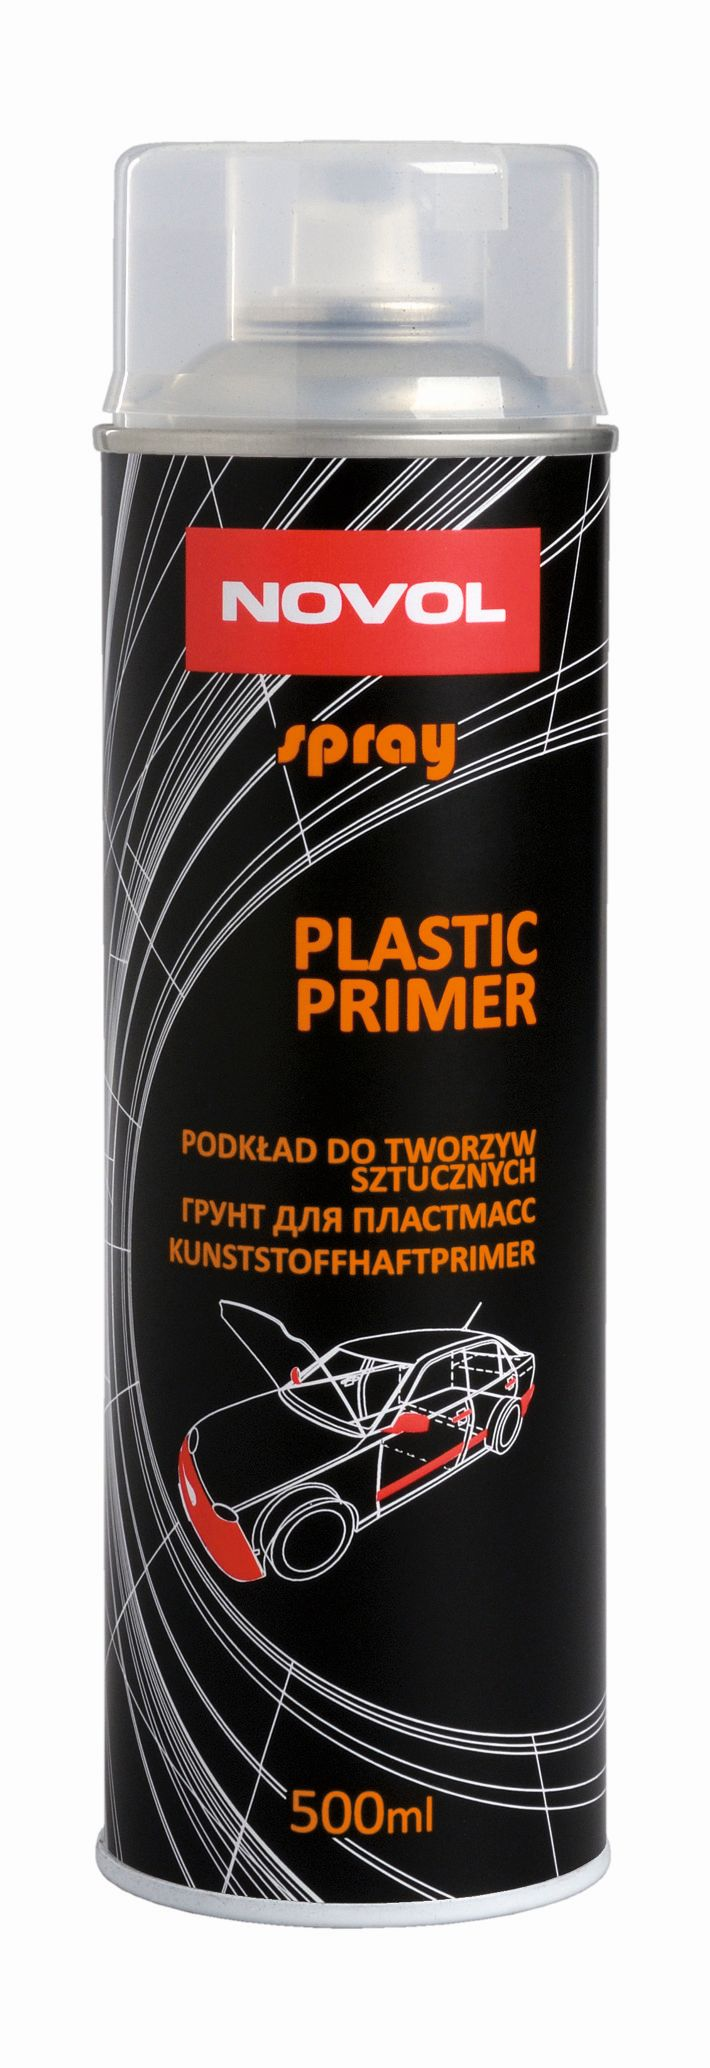 Novol Plastic Primer